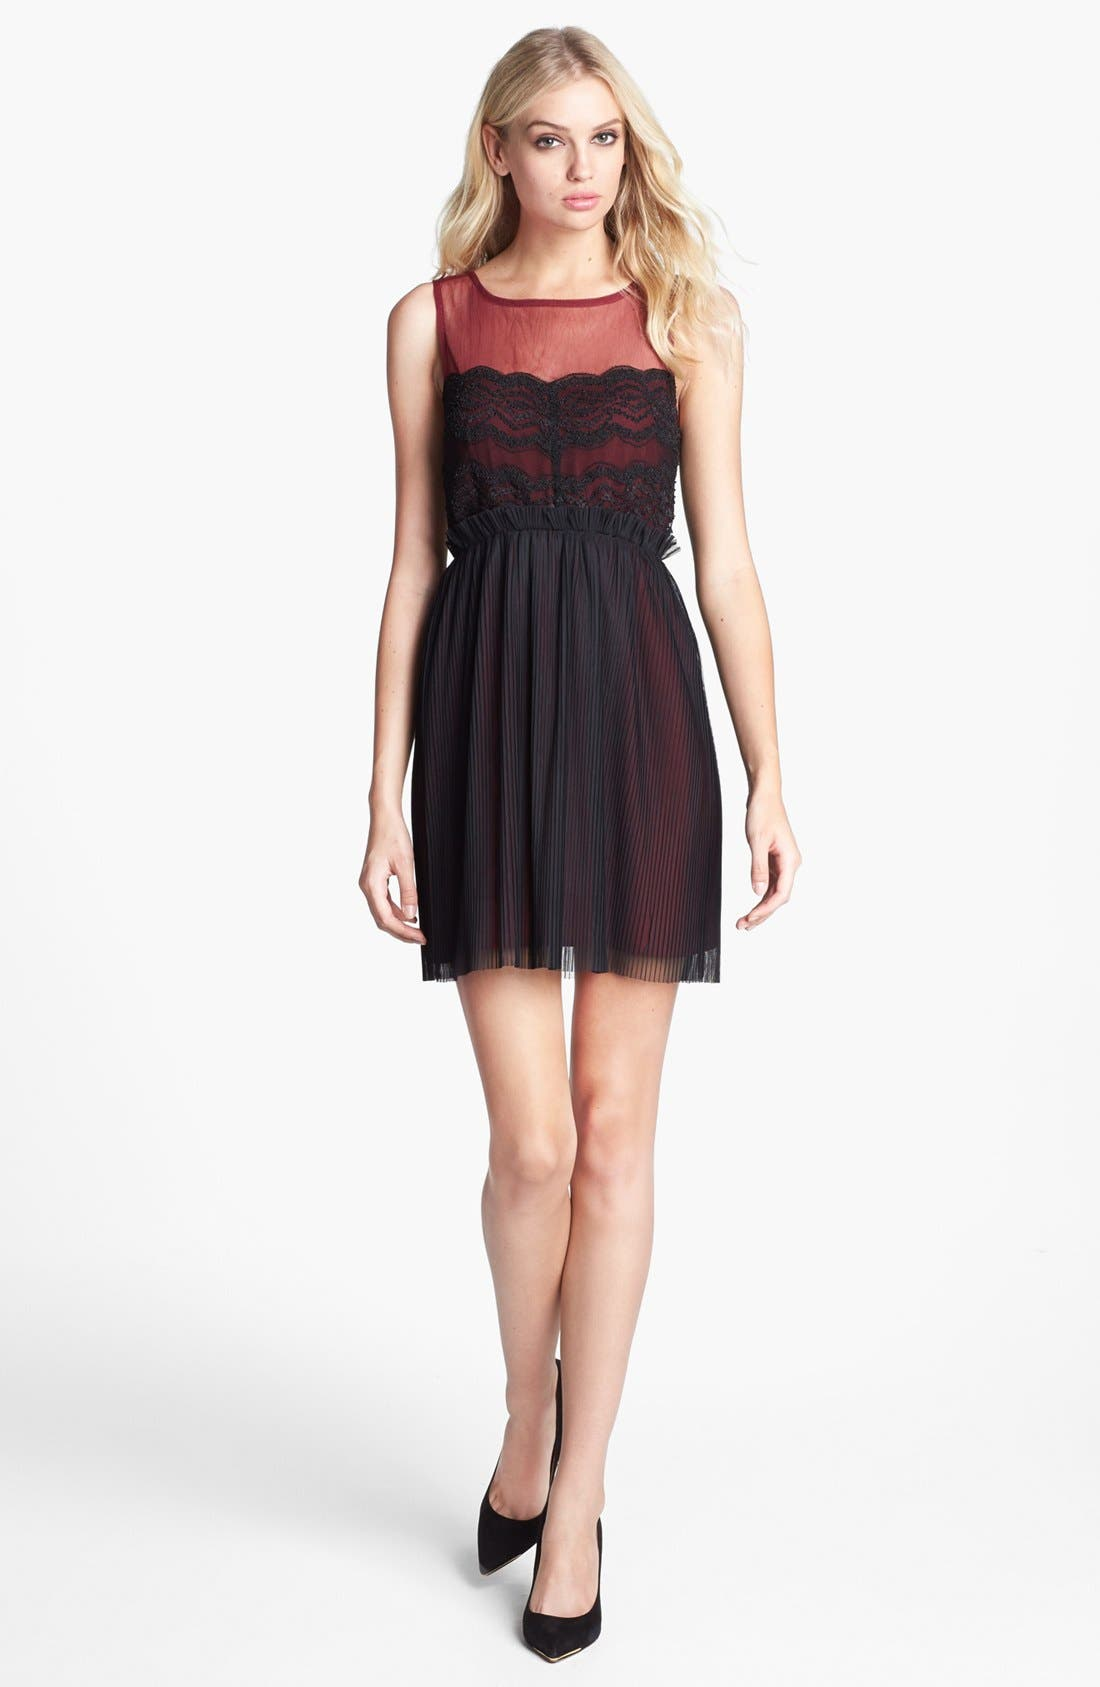 Alternate Image 1 Selected - Black Swan Lace & Chiffon Dress